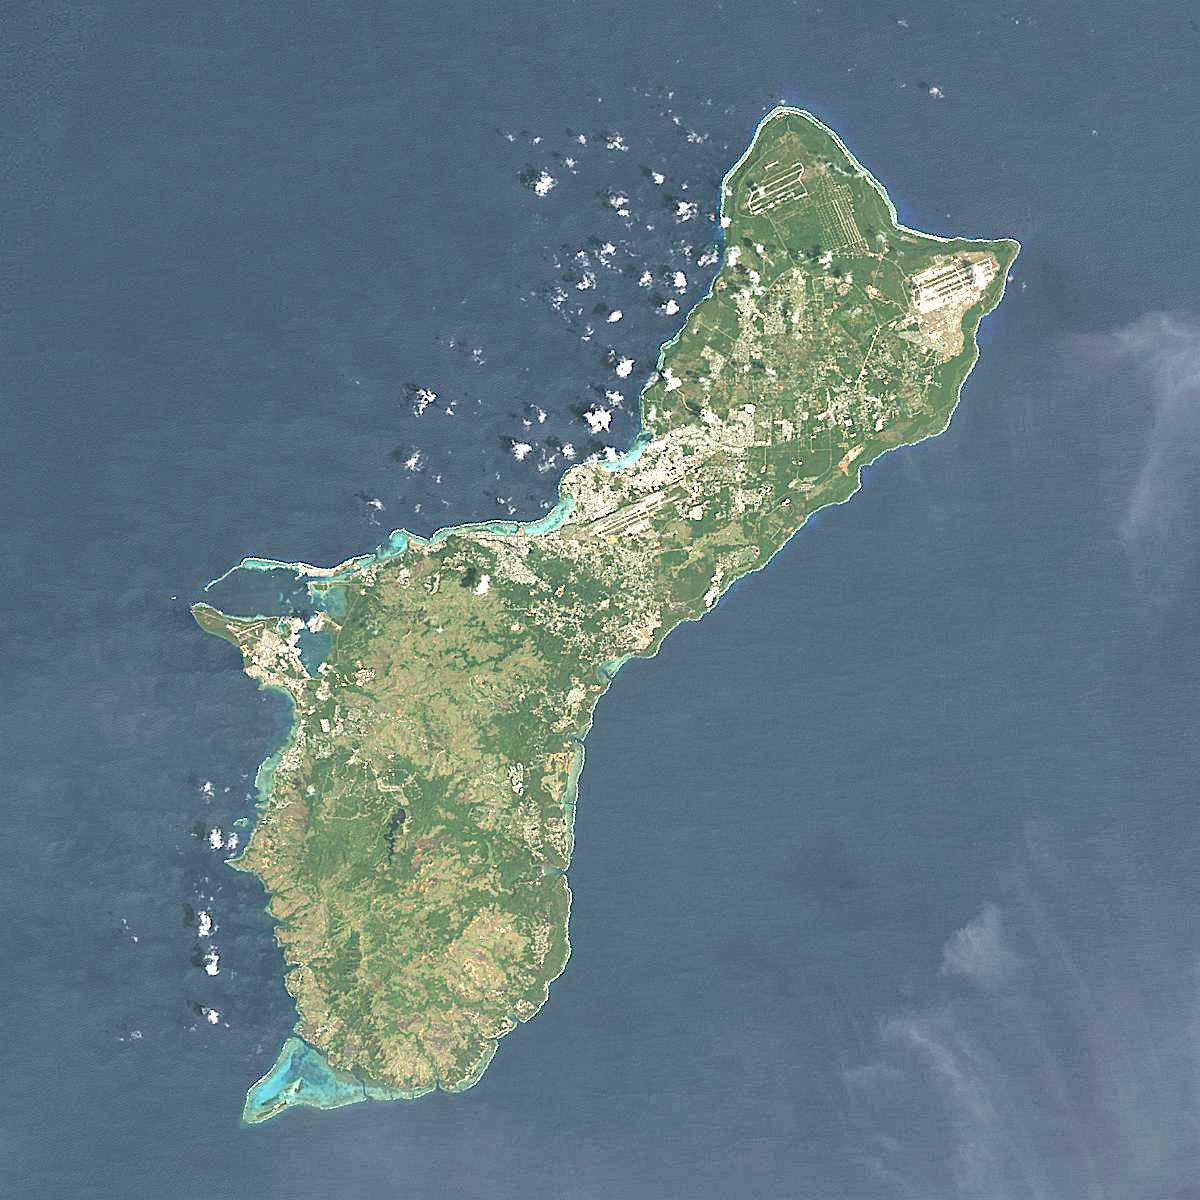 FileUSA Guam Satellite Image Location Mapjpg Wikimedia Commons - Satellite location map